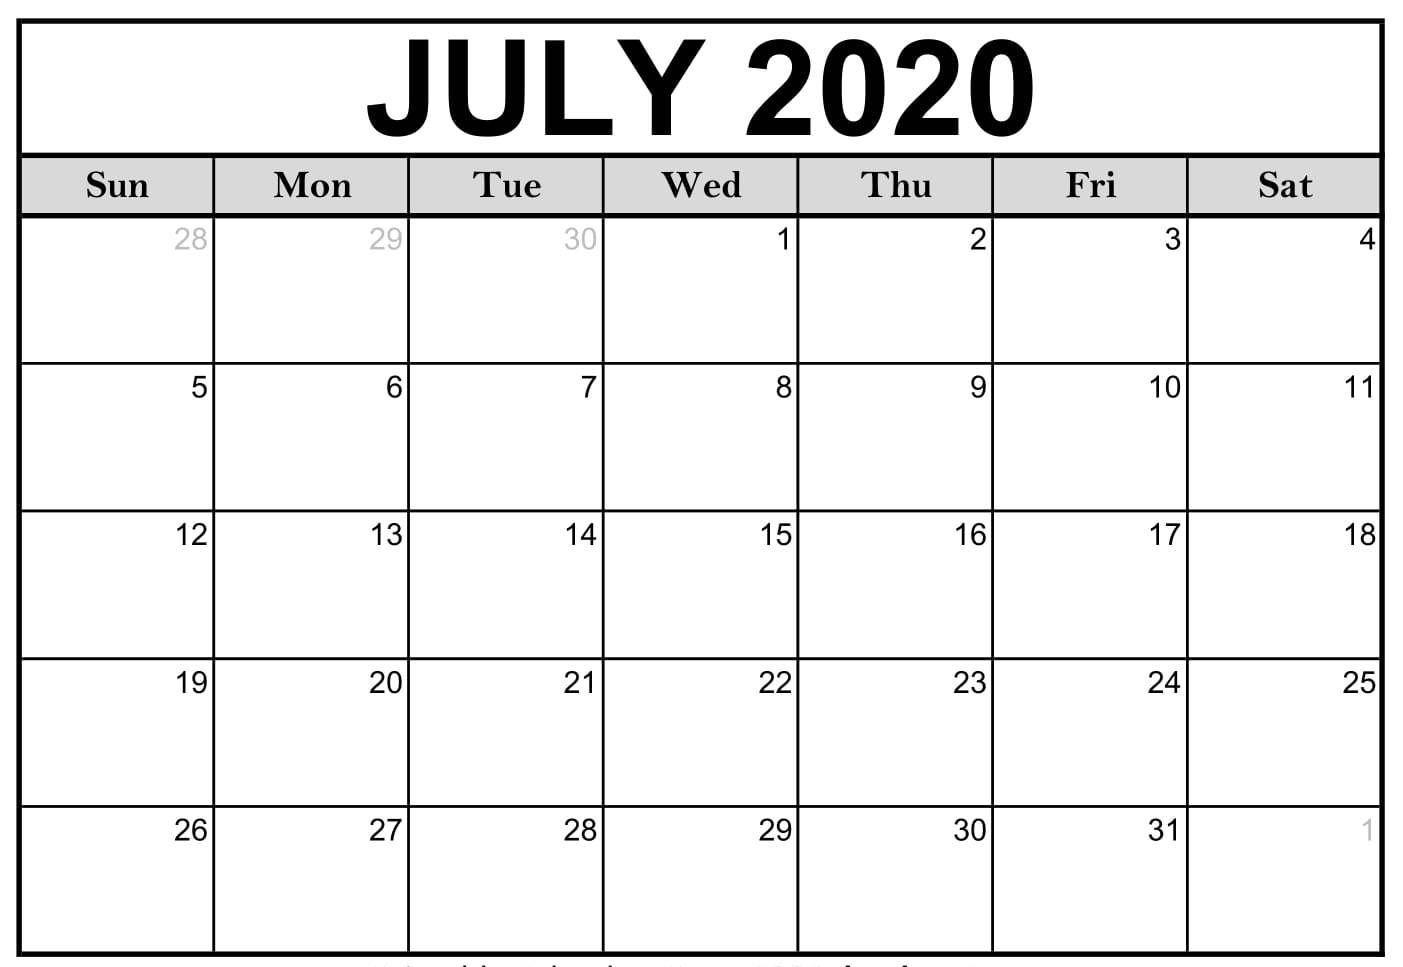 July 2020 Printable Calendar, #Calendar #July